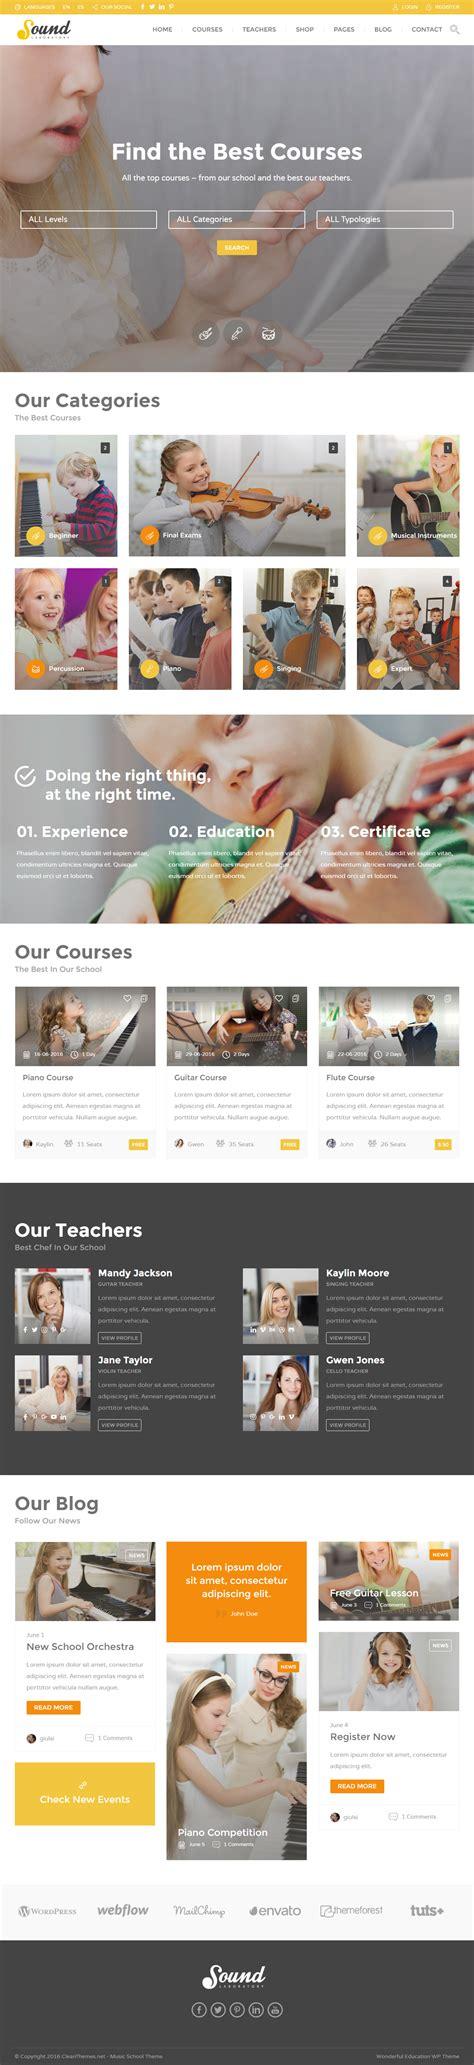 notacorda music school wordpress theme education best wordpress music school theme 2017 responsive miracle